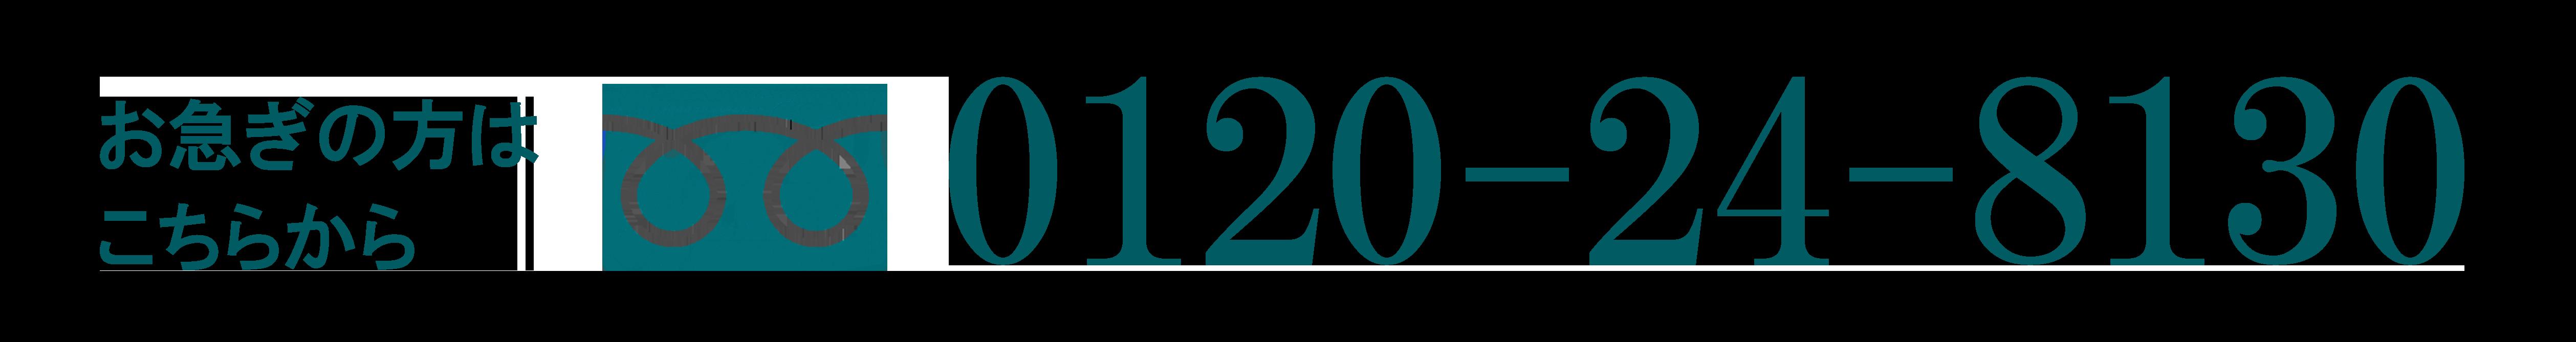 0120-24-8130